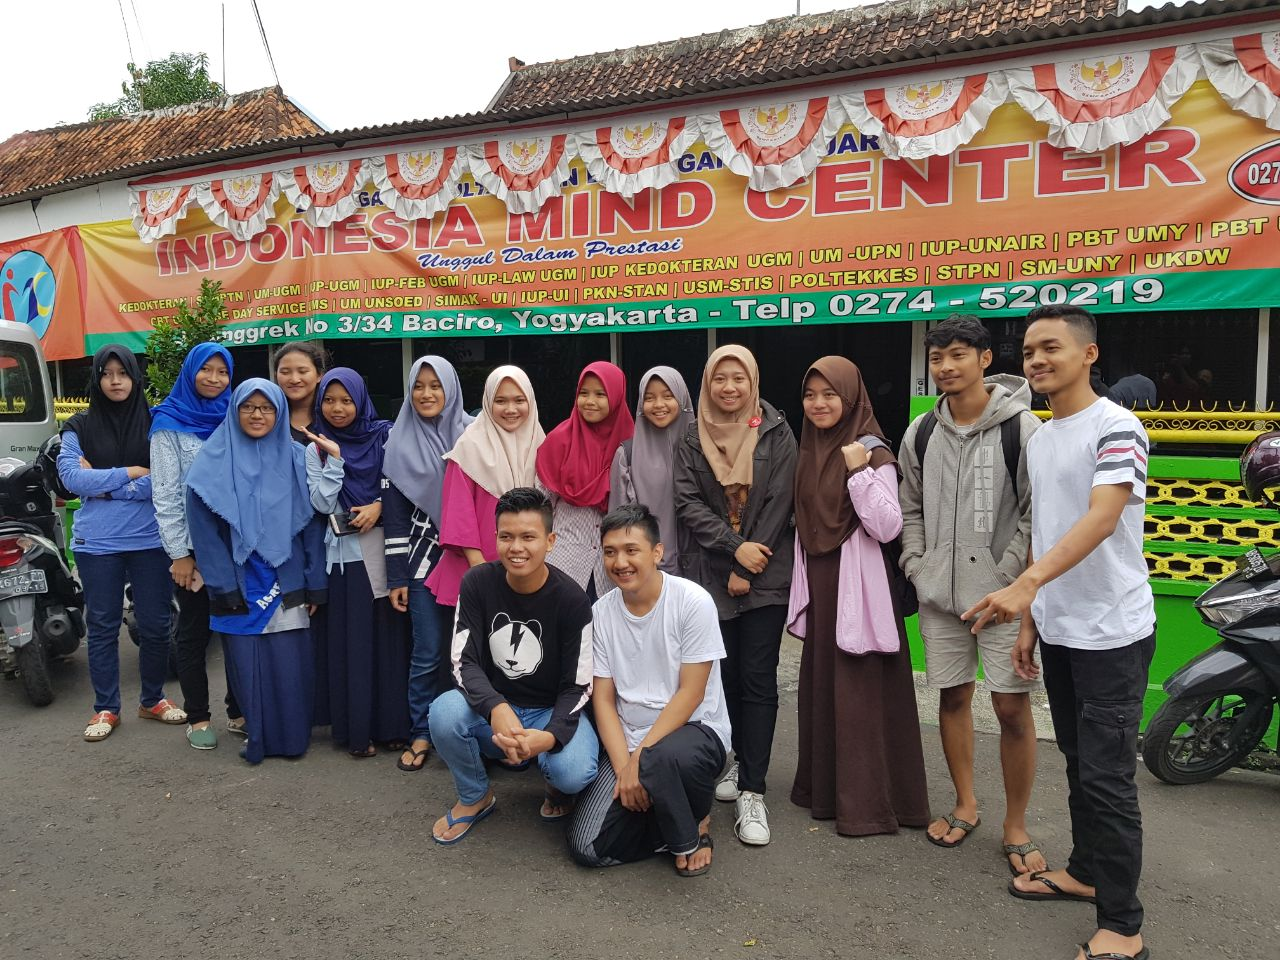 Indonesia Mind Center